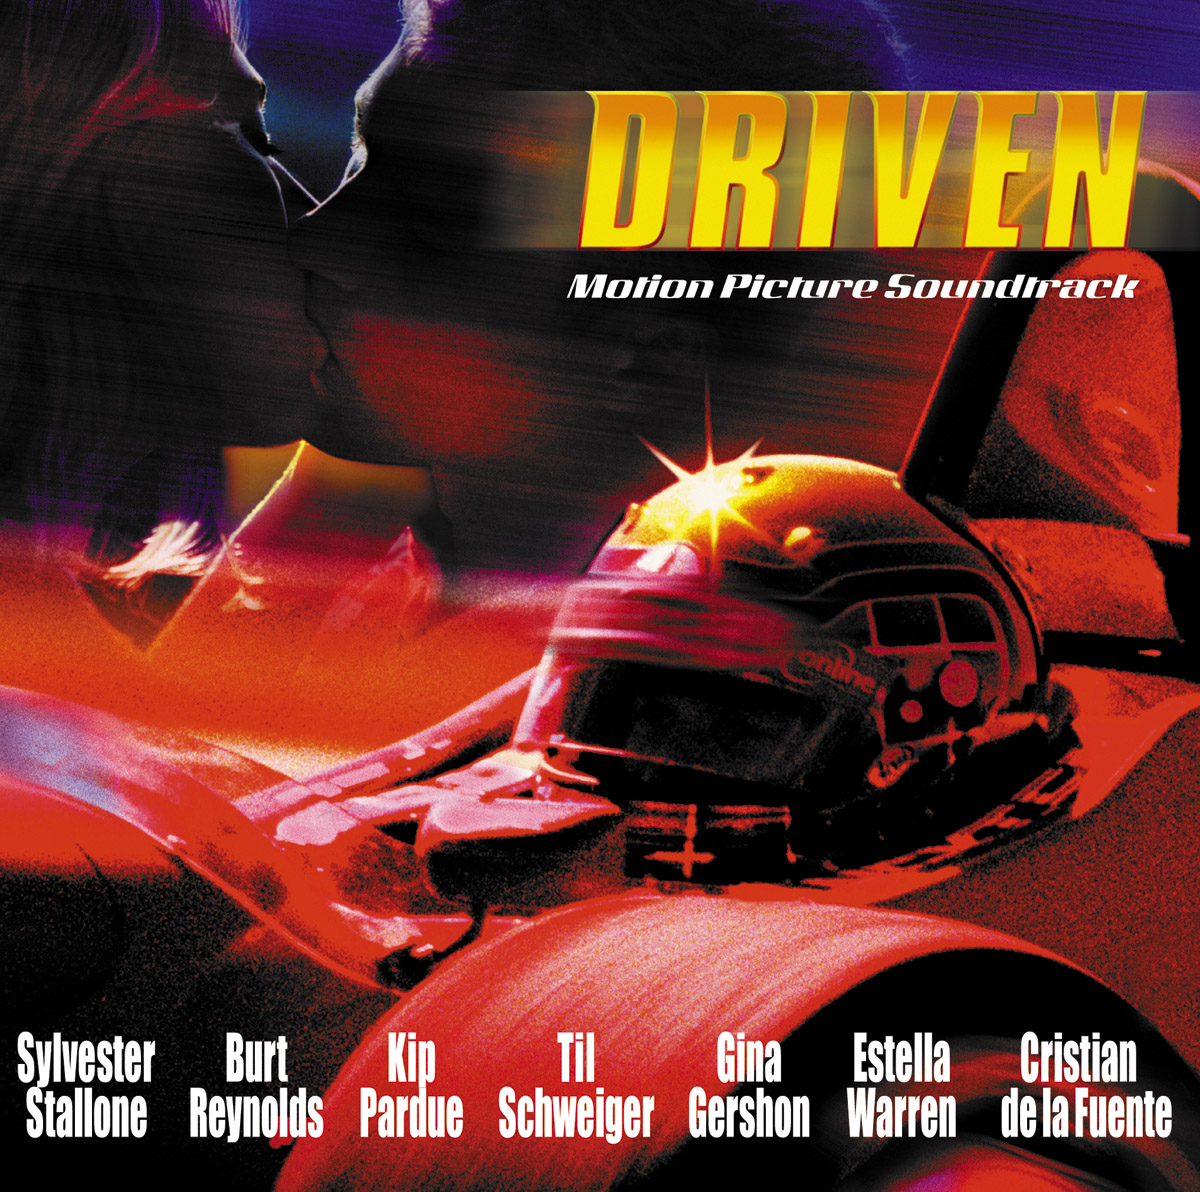 DrivenCD CVR 5mg.jpg